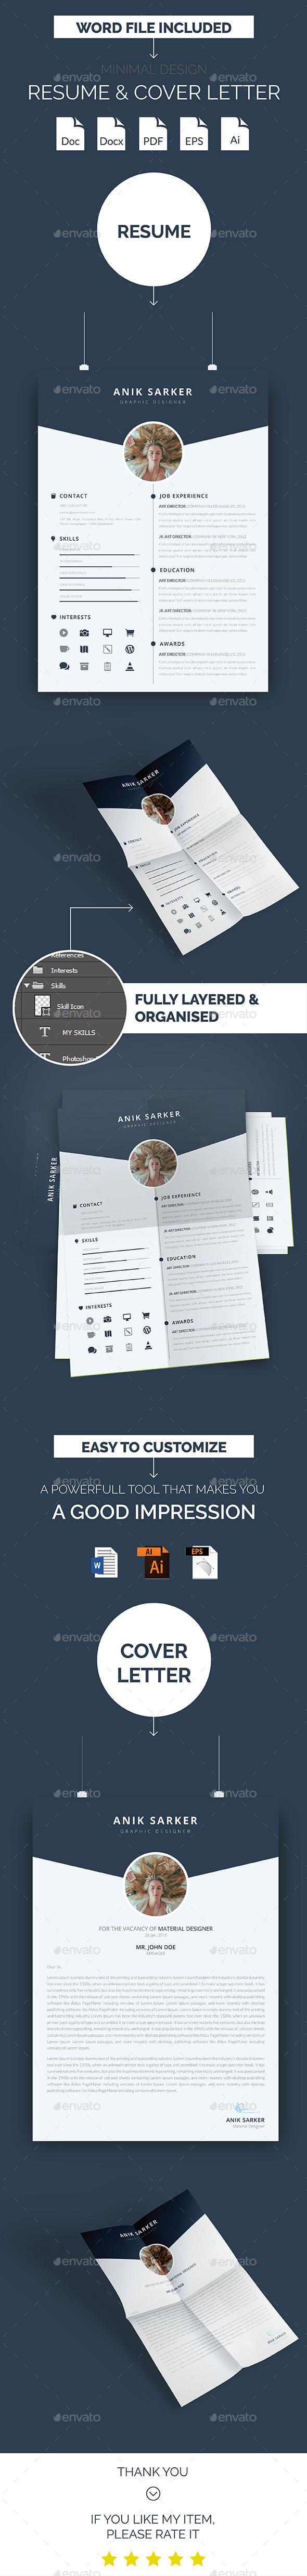 Minimal Design Resume & Cover Letter - Resumes Stationery